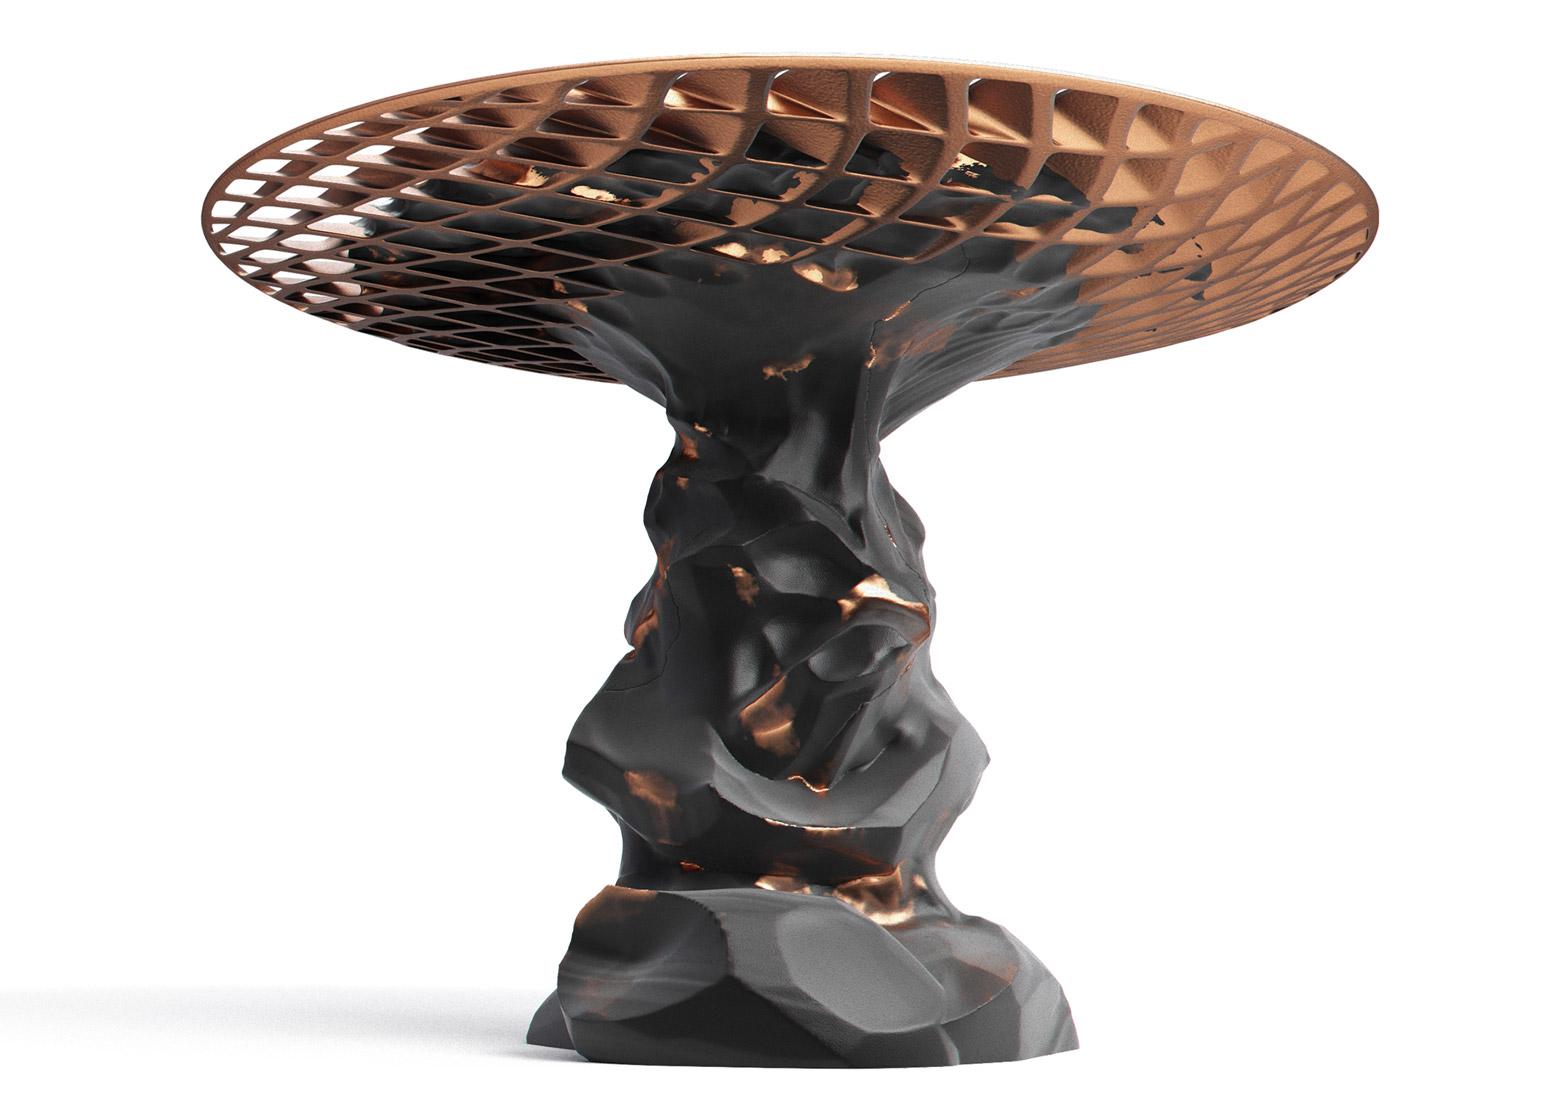 Boom! Janne Kyttanen's Literally Explosive 3D Prints